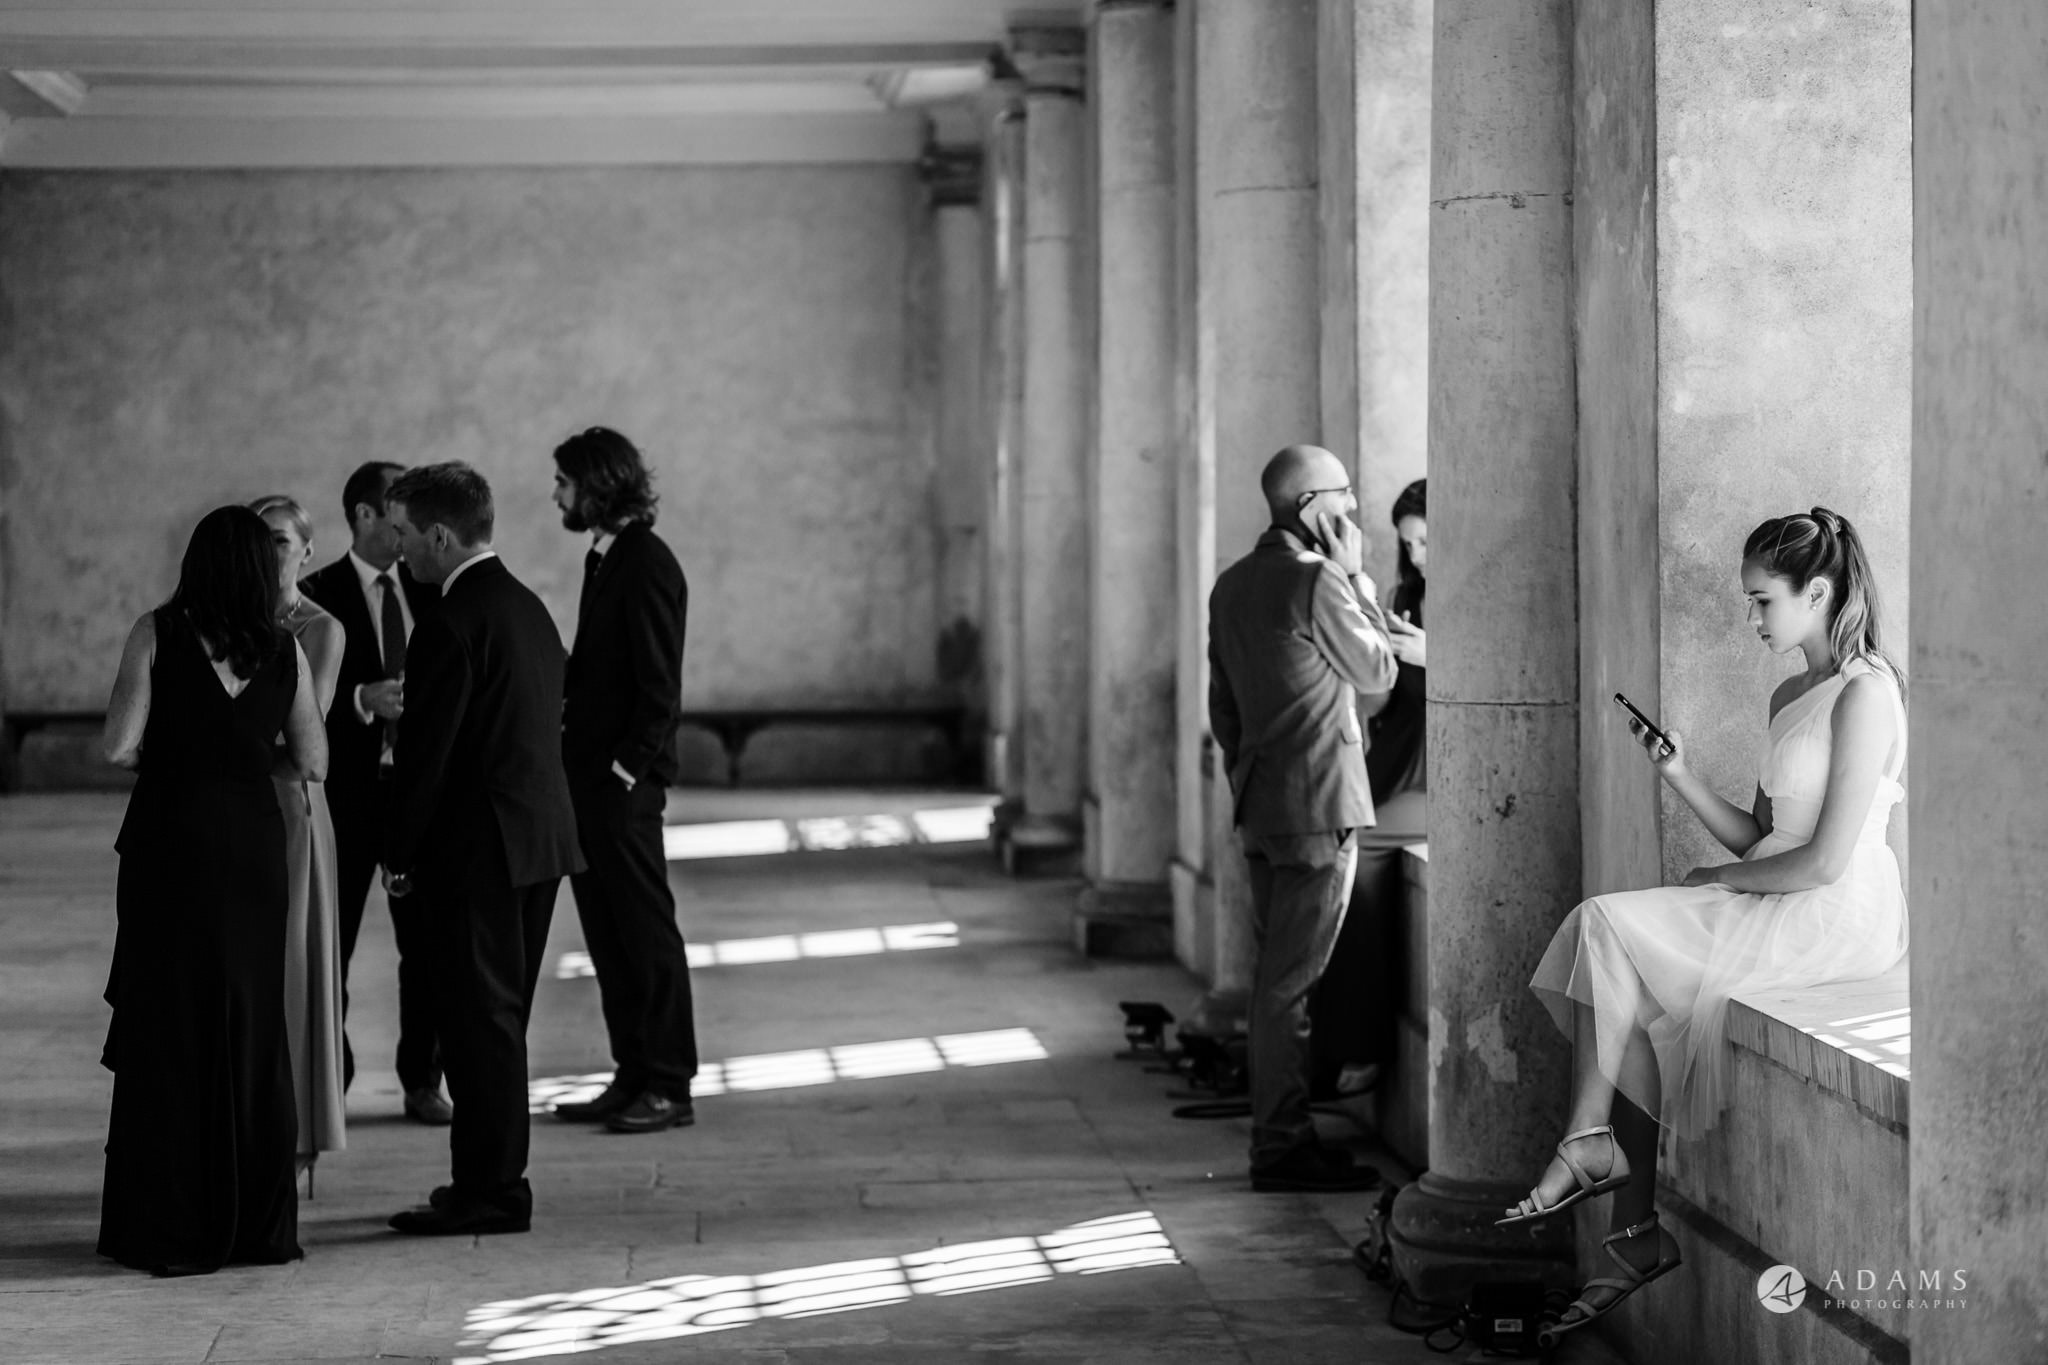 Trinity College Cambridge wedding guests in the reception area